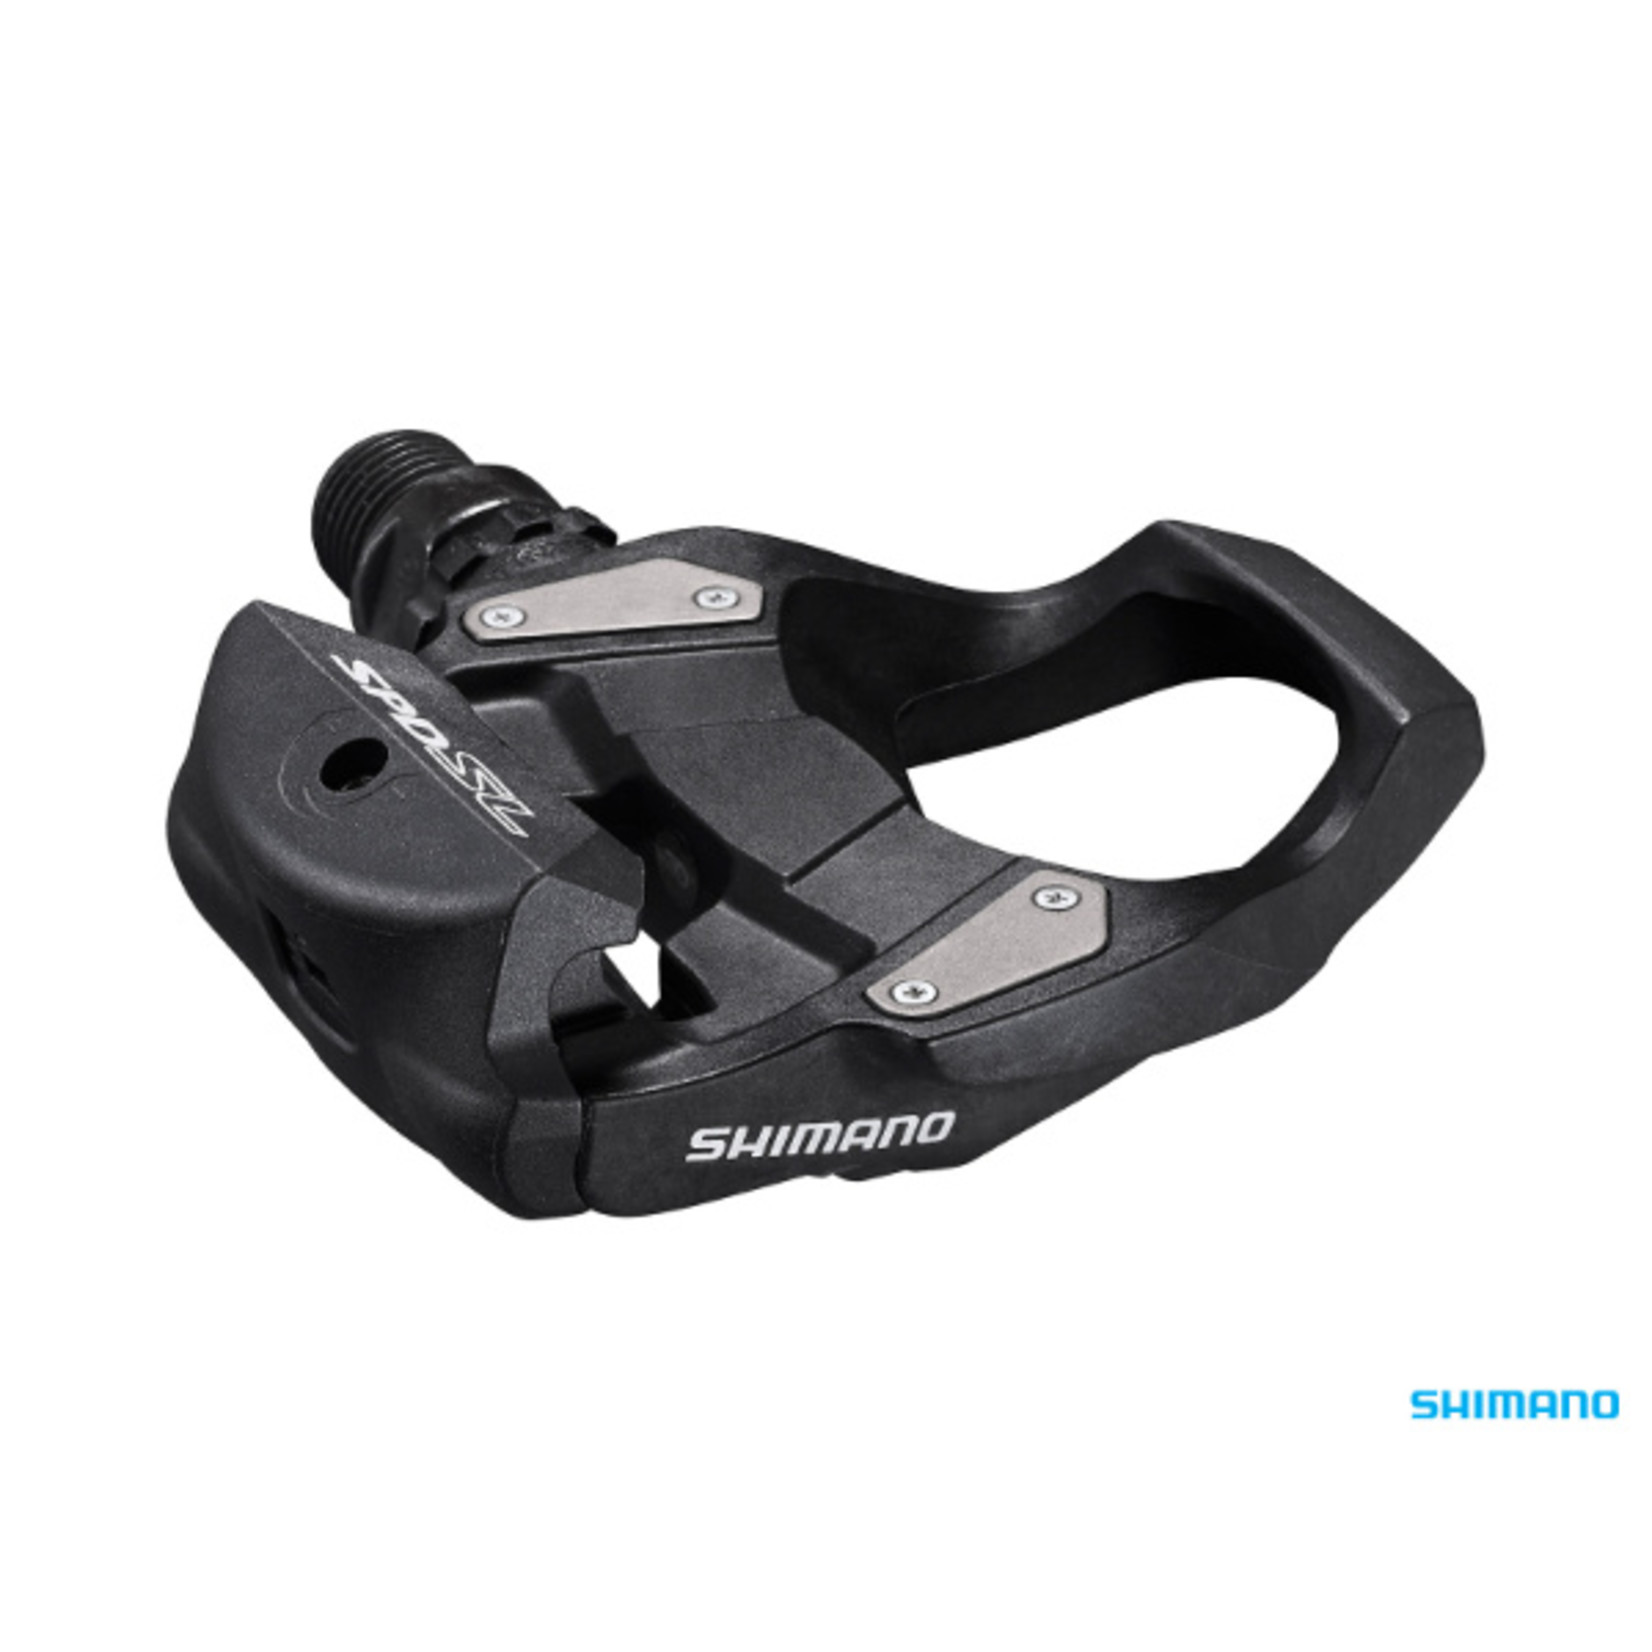 Shimano Shimano, PD-RS500 SPD-SL Pedals Black